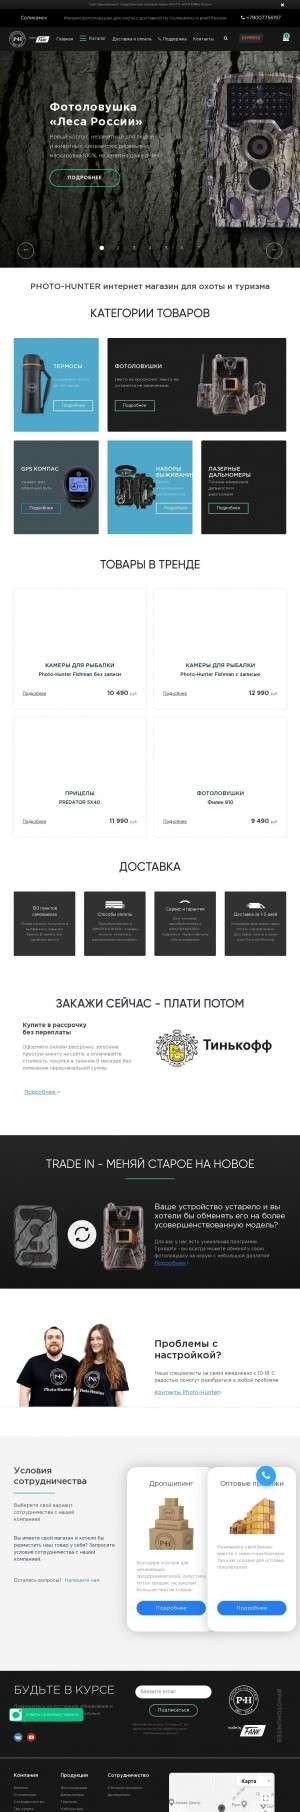 Предпросмотр для solikamsk.photo-hunter.org — Photo-Hunter